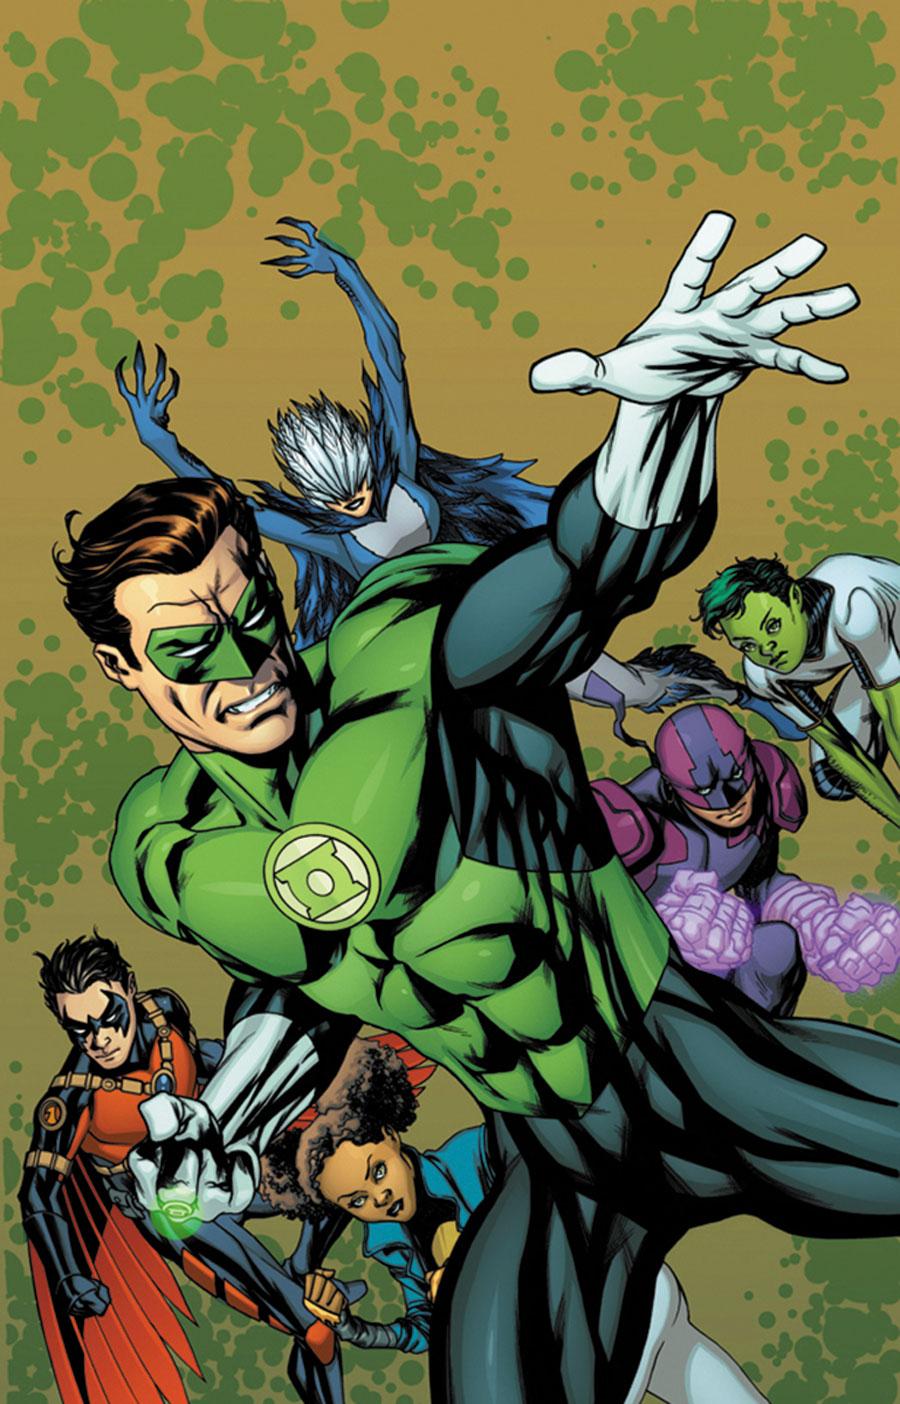 Teen Titans Vol 5 12 Textless Green Lantern 75th Anniversary Variant.jpg